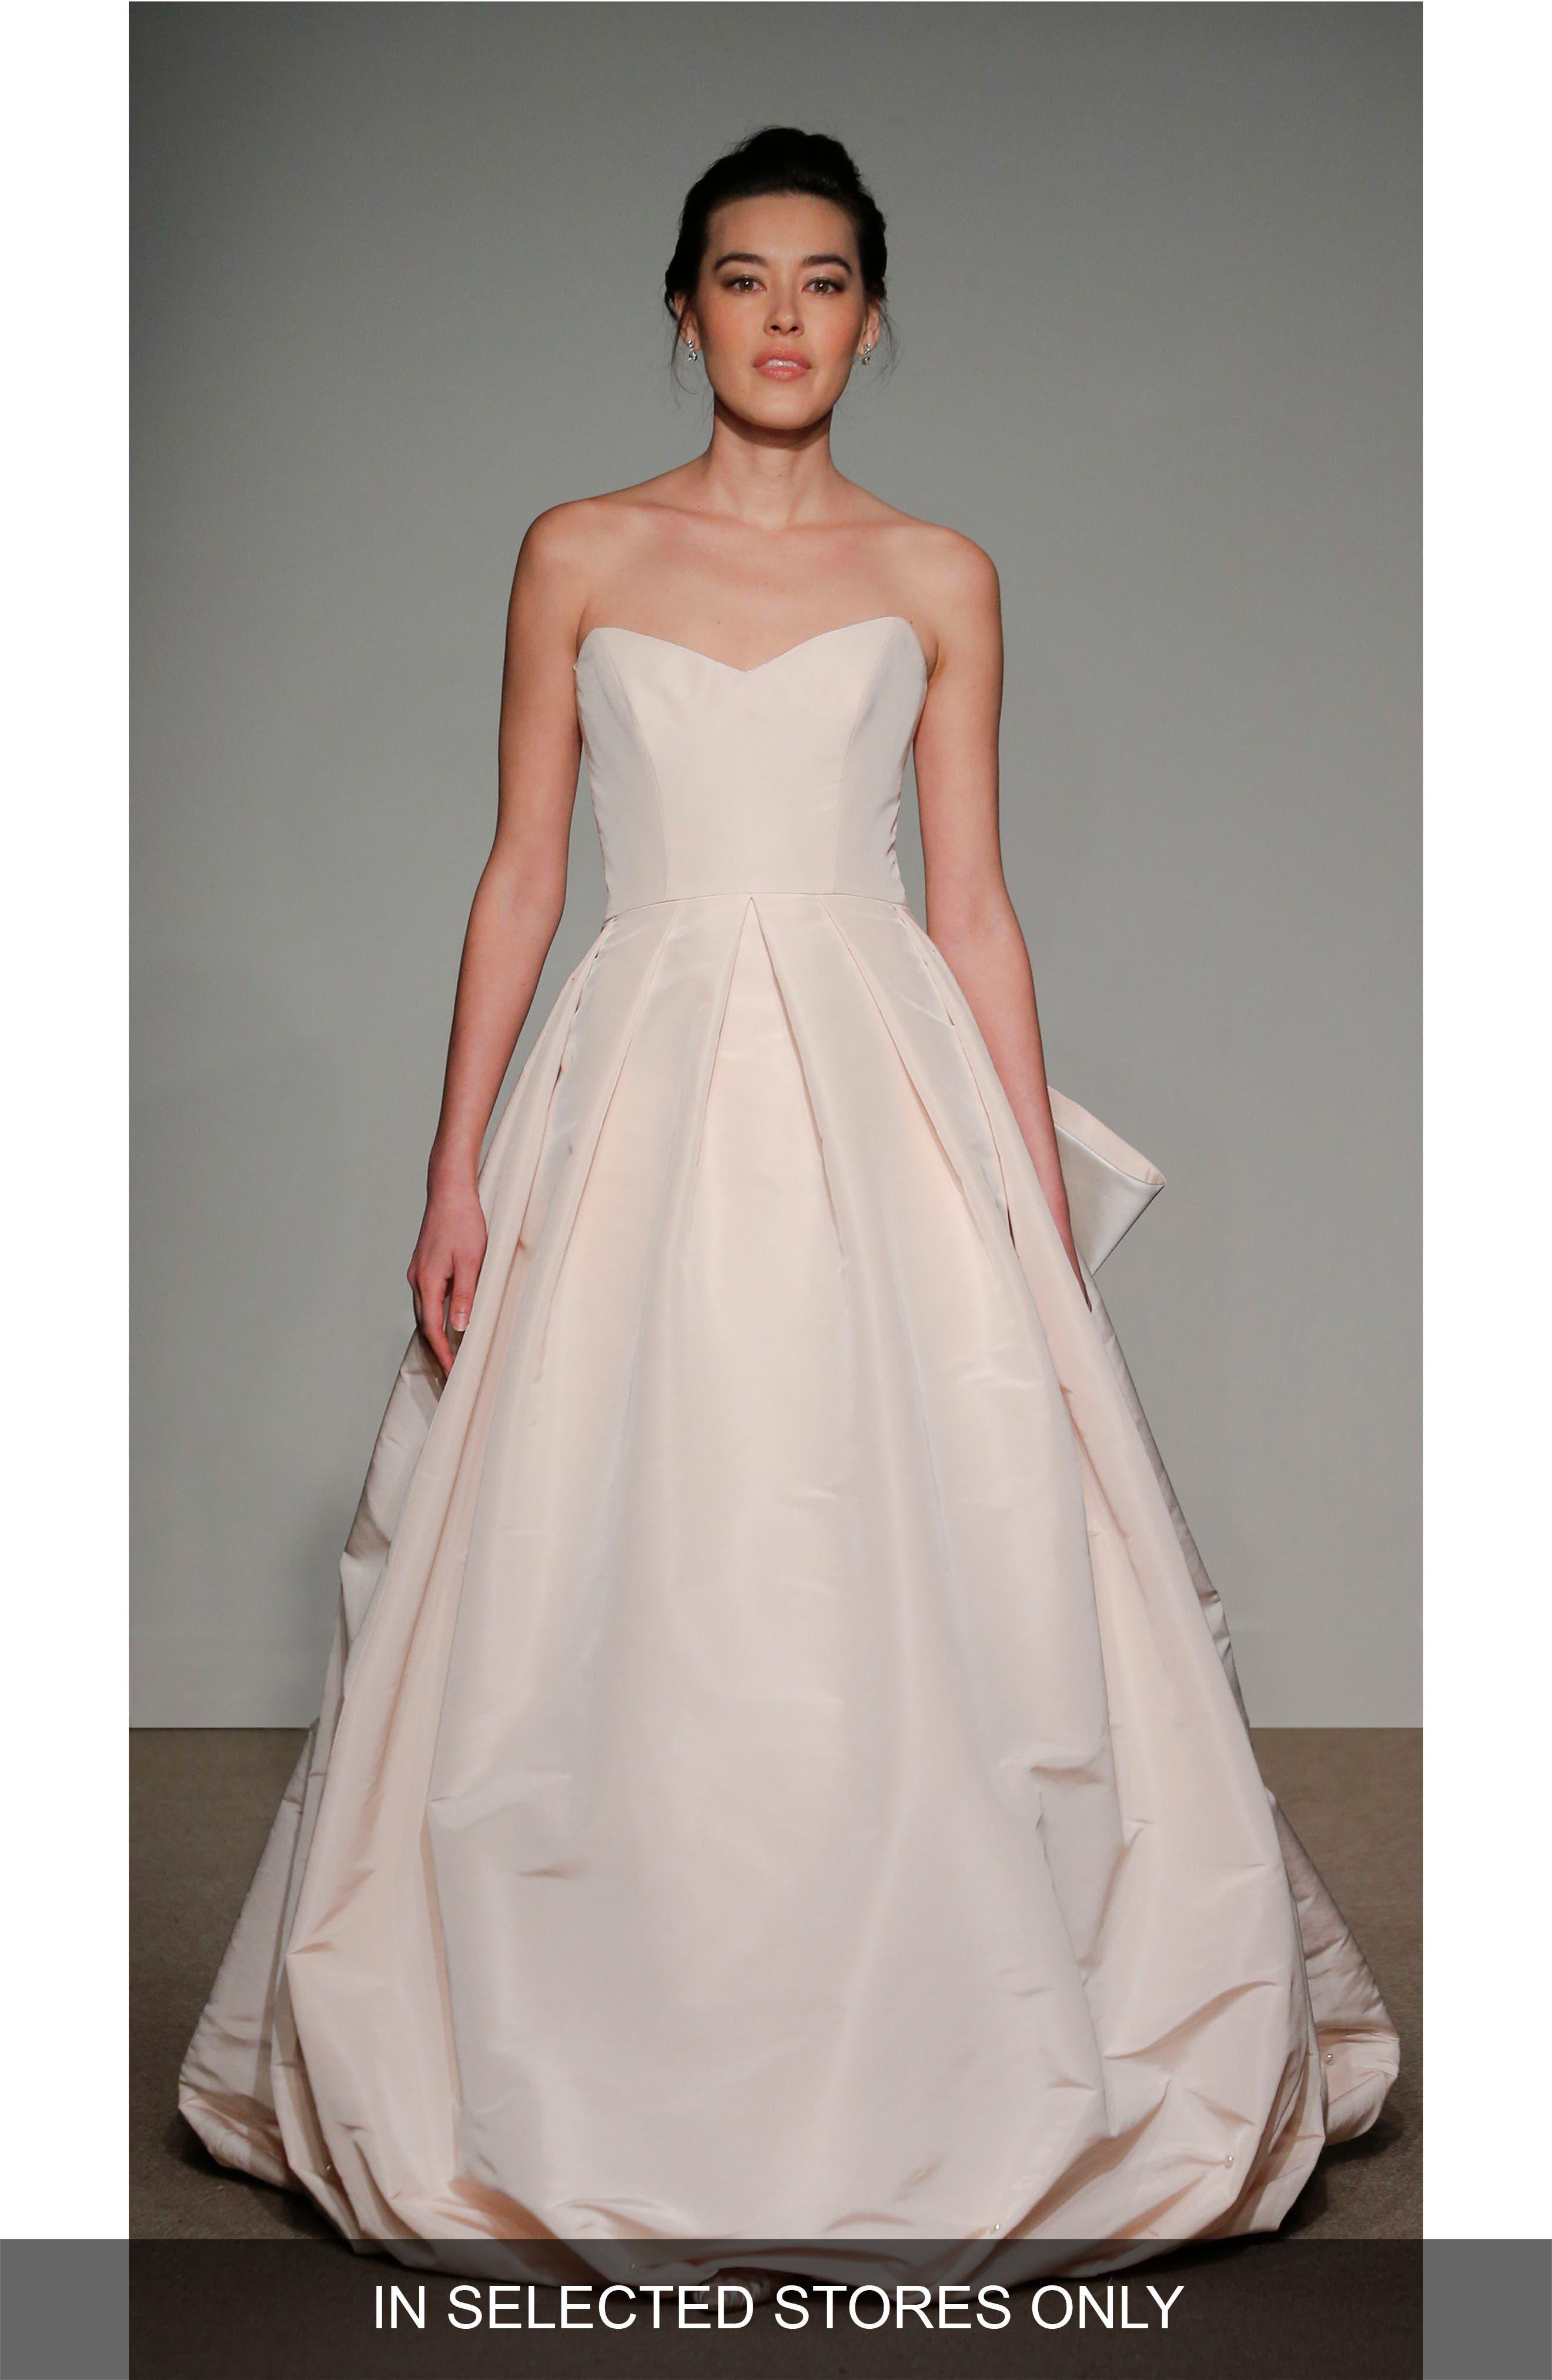 Cheri Bow Detail Strapless Faille Ballgown,                         Main,                         color, Soft White